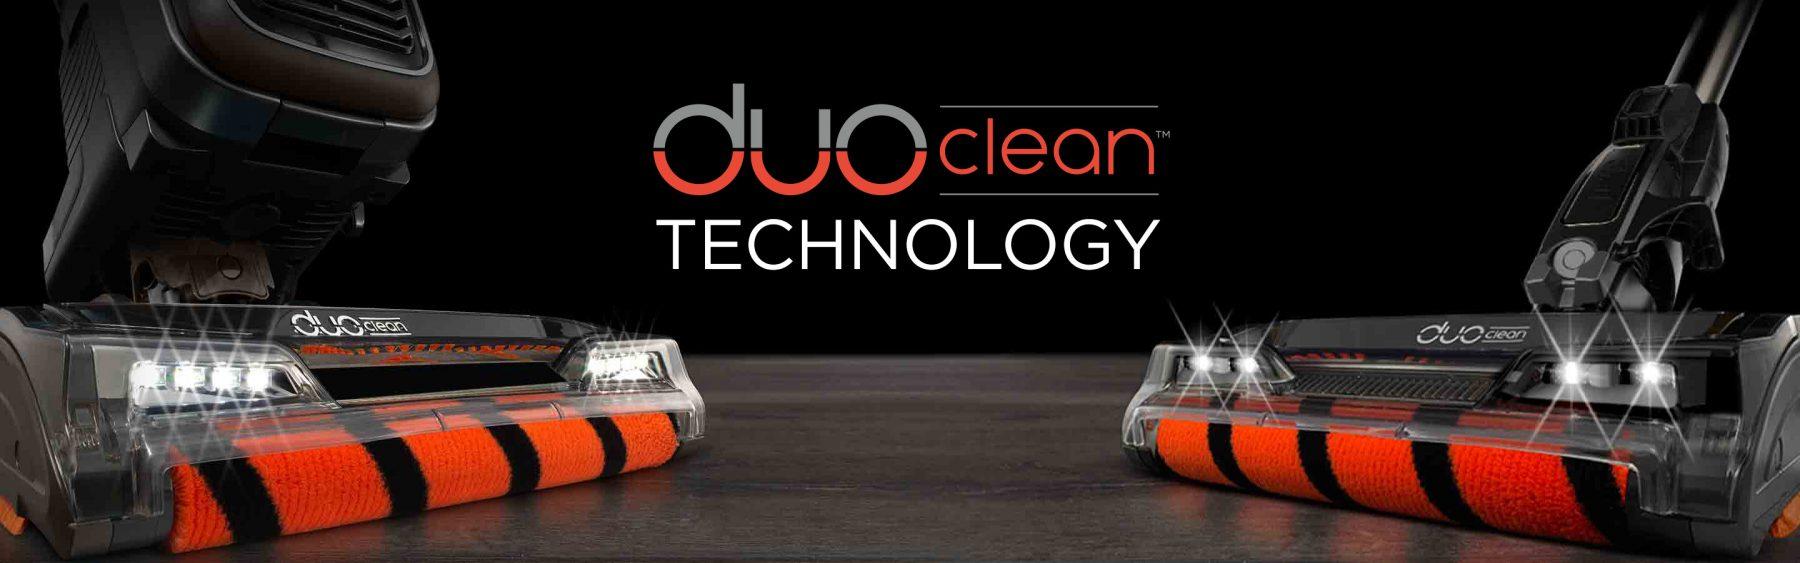 Shark DuoClean Vacuum Cleaner Technology